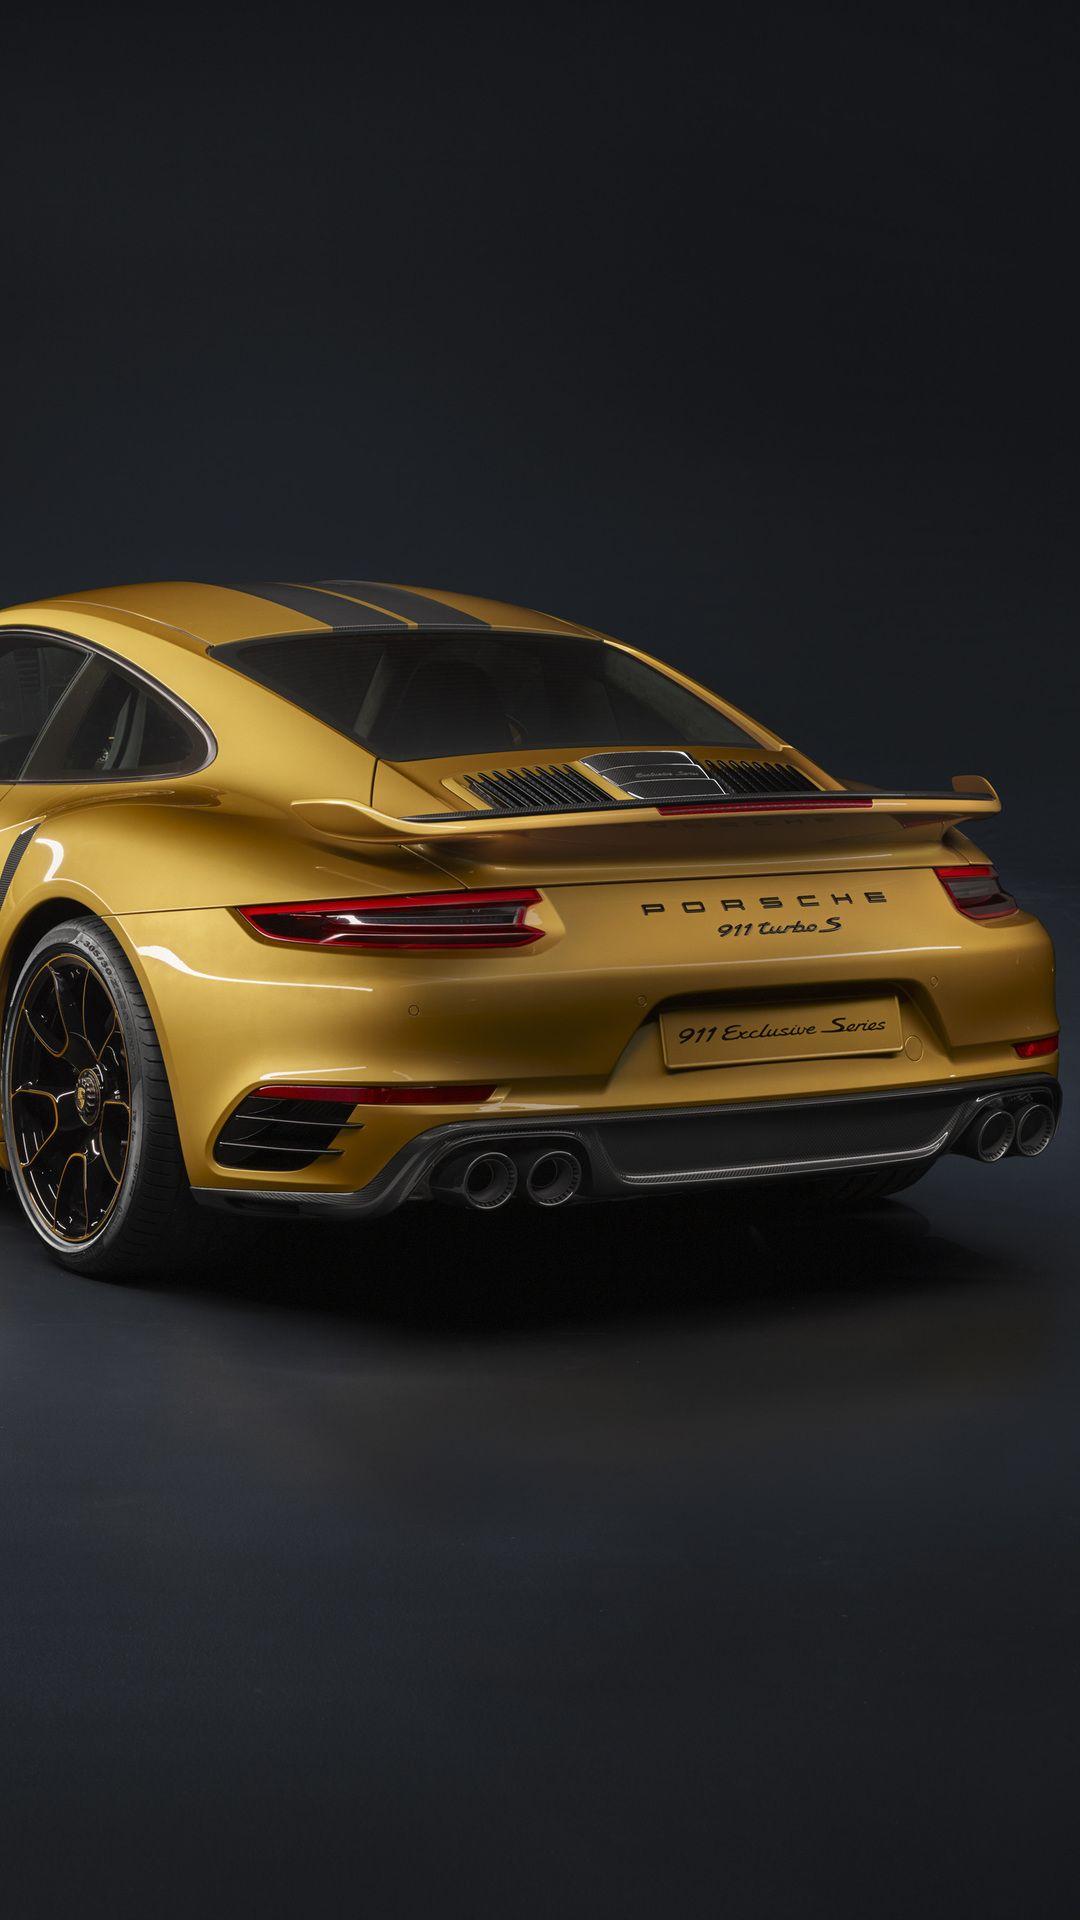 Porsche 911 Turbo S Exclusive Series Porsche 911 Turbo Super Luxury Cars Porsche Sports Car